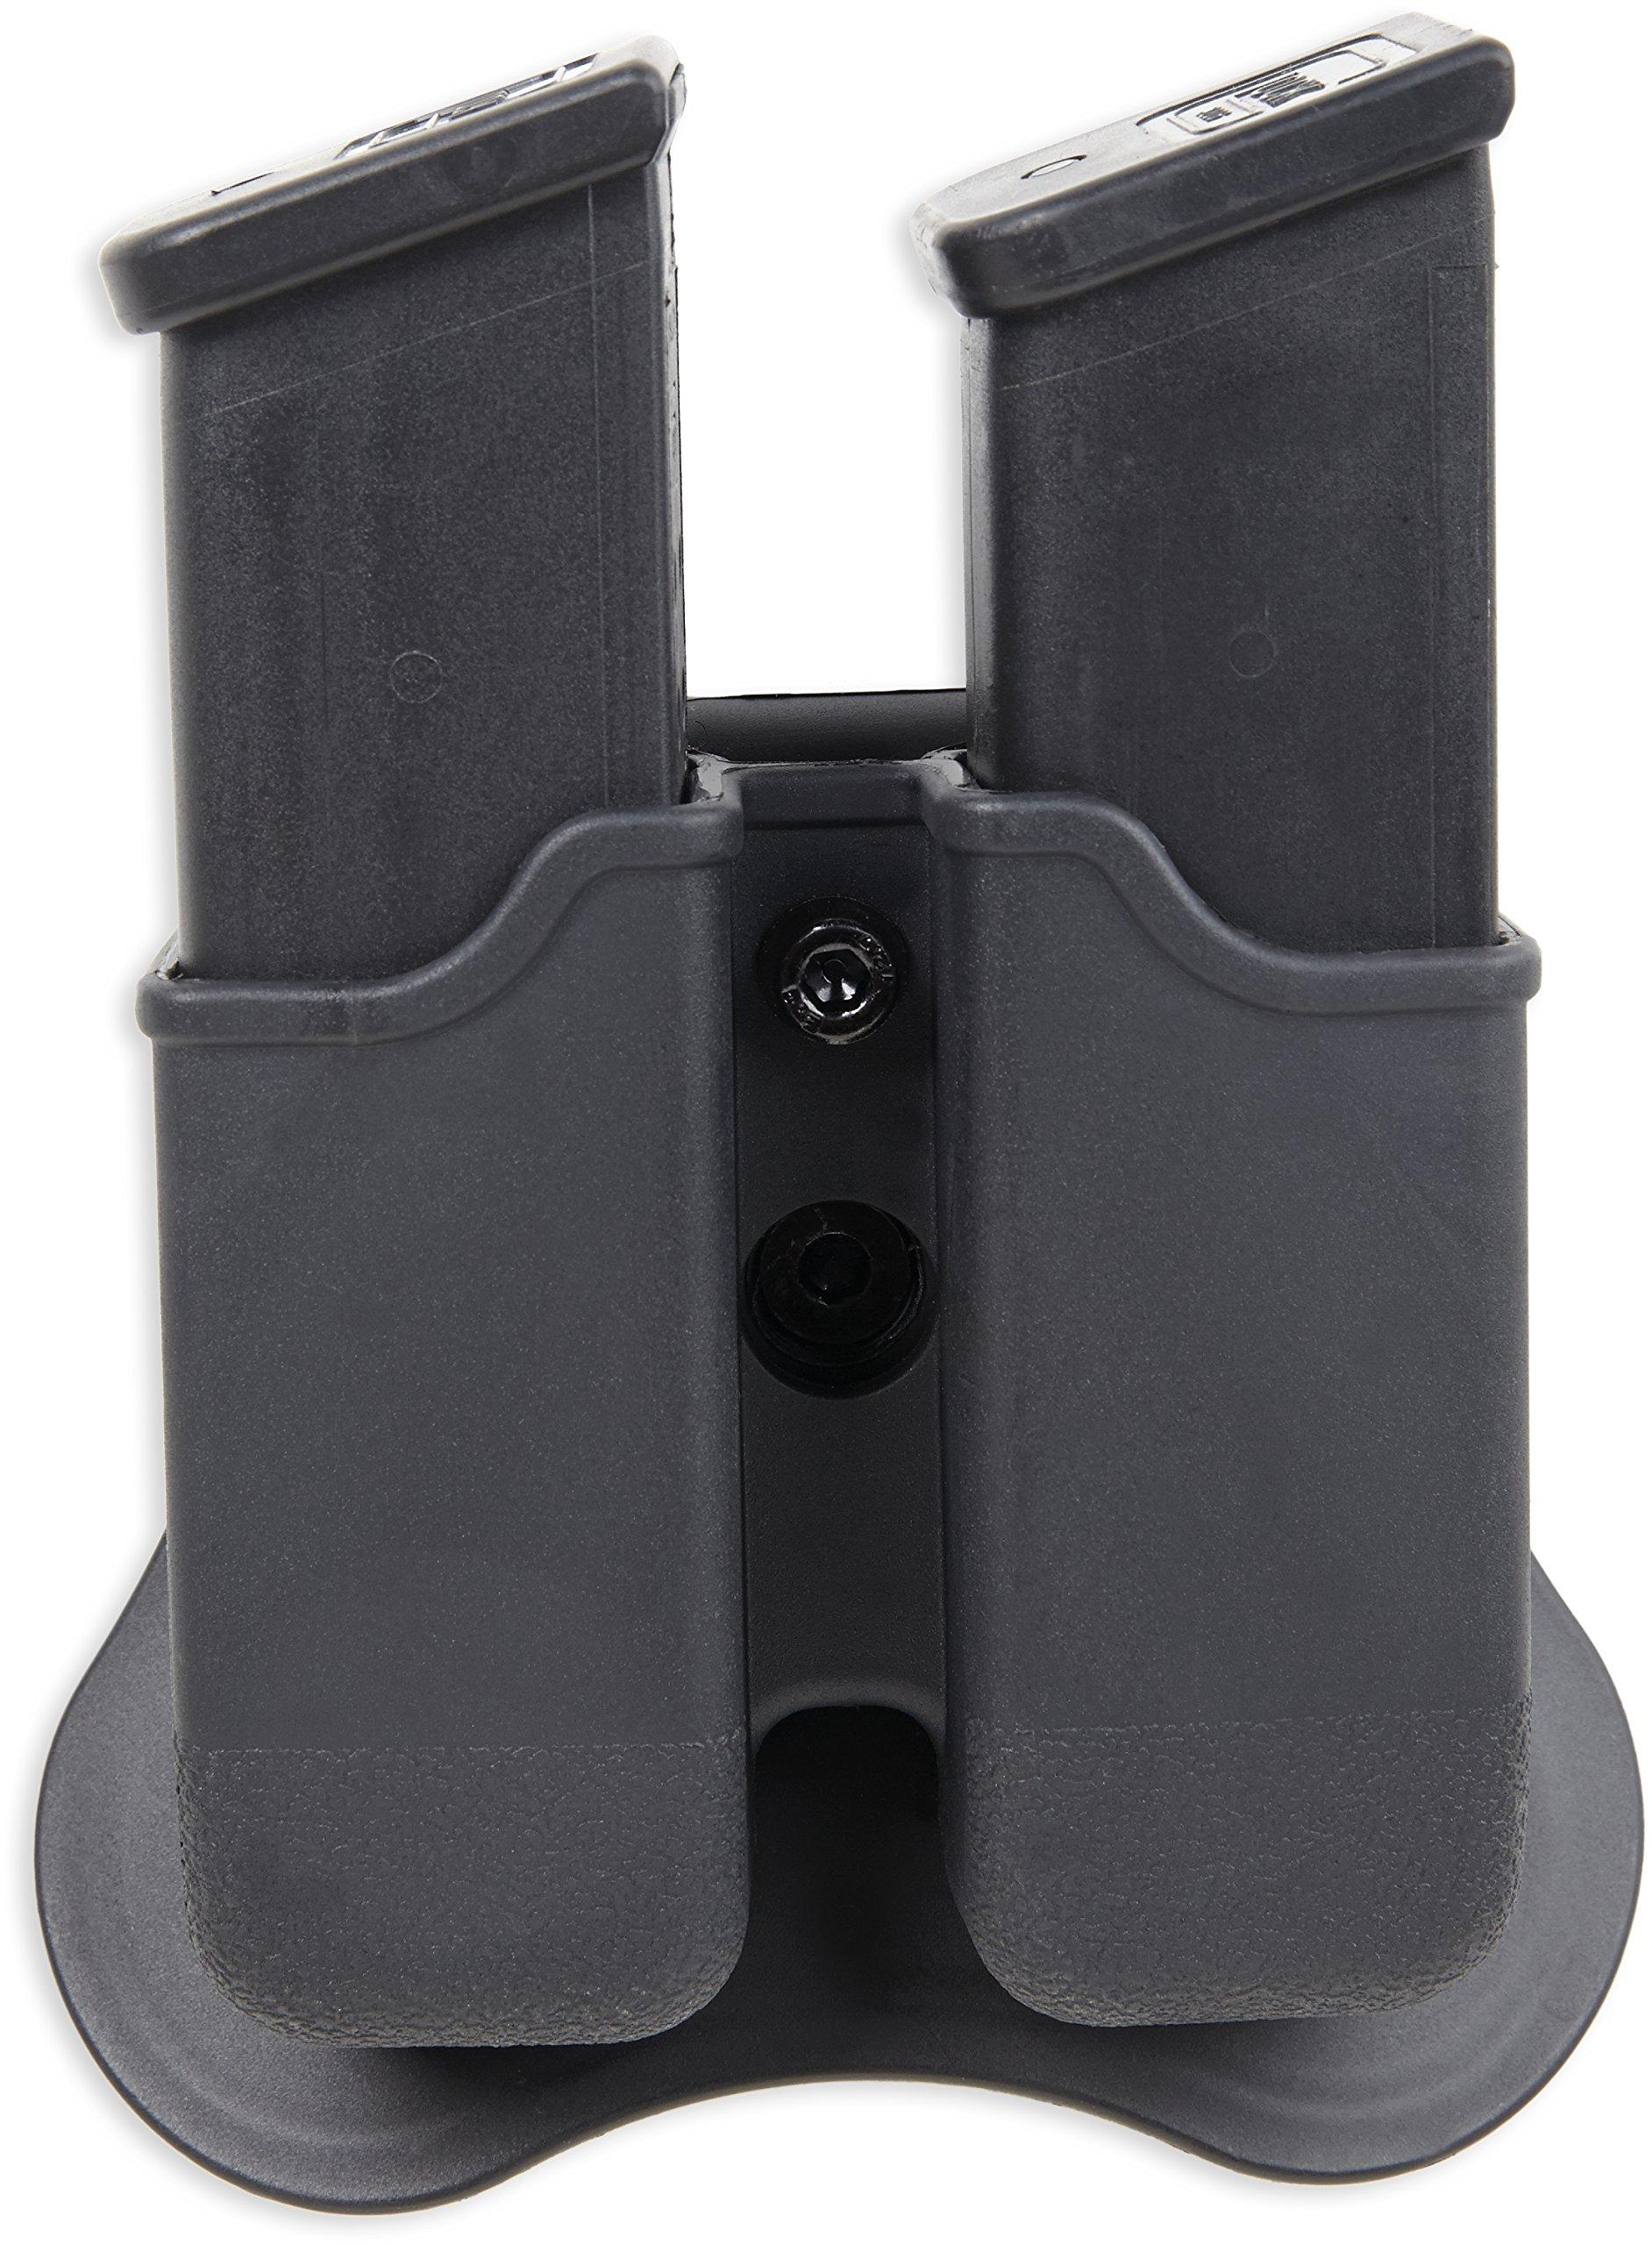 Bulldog Cases P-GM Polymer Magazine Holder, Black, Left/Right by Bulldog Cases (Image #4)